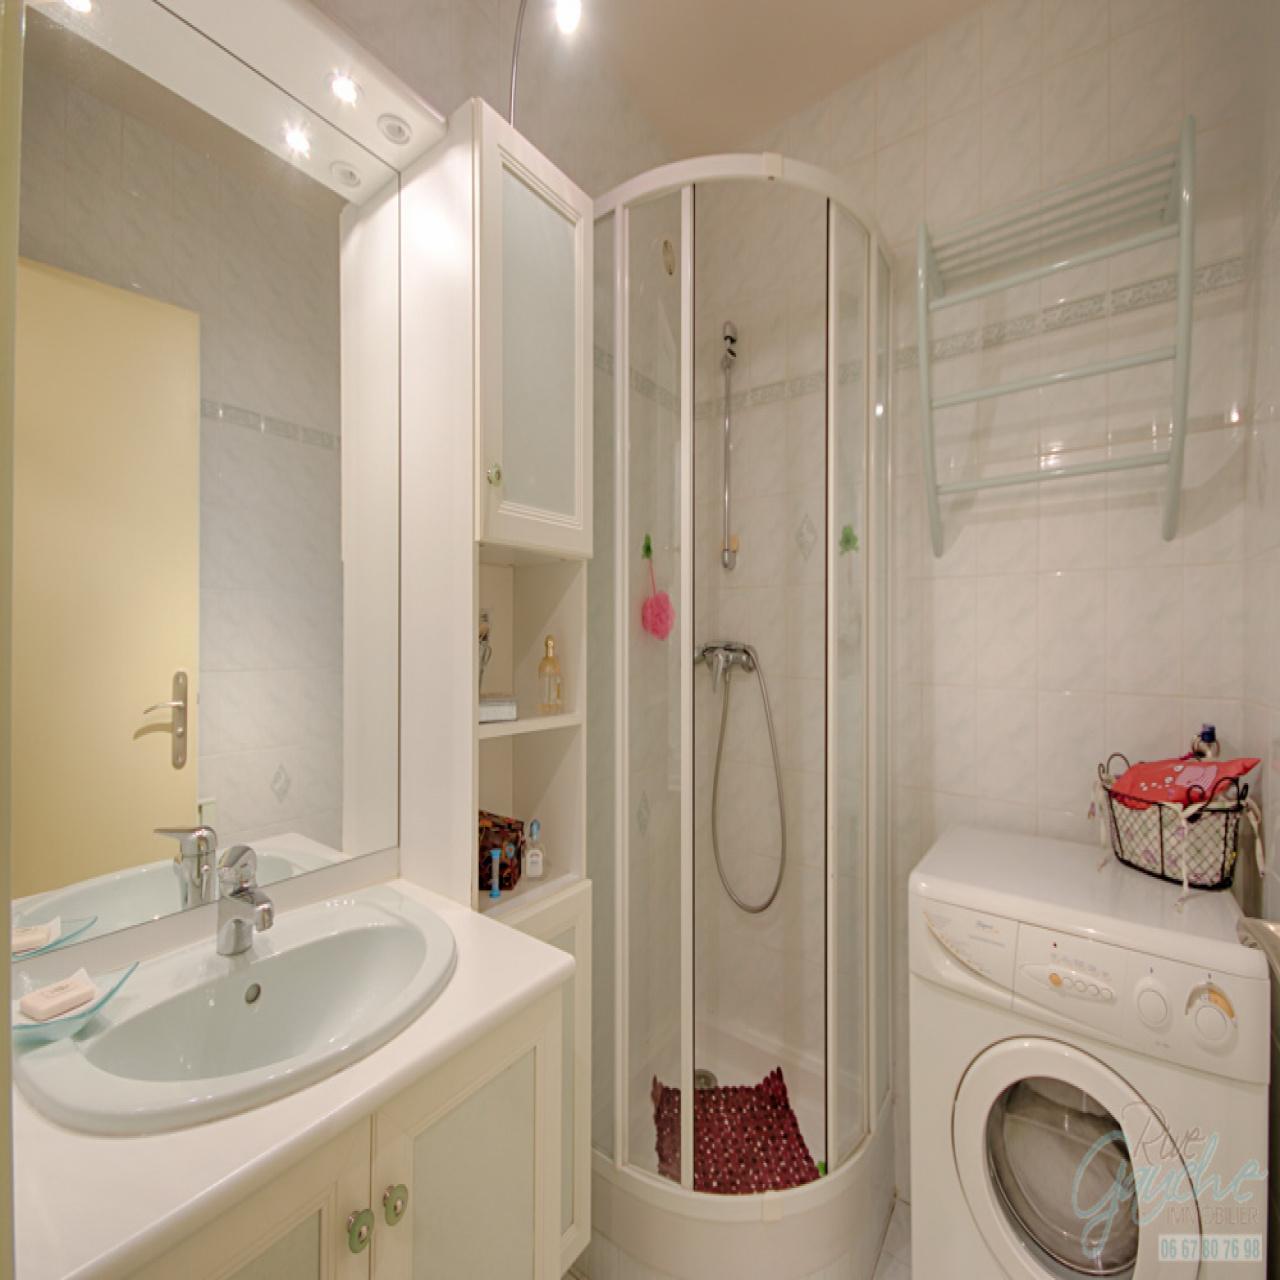 Image_6, Appartement, Meythet, ref :FI3195